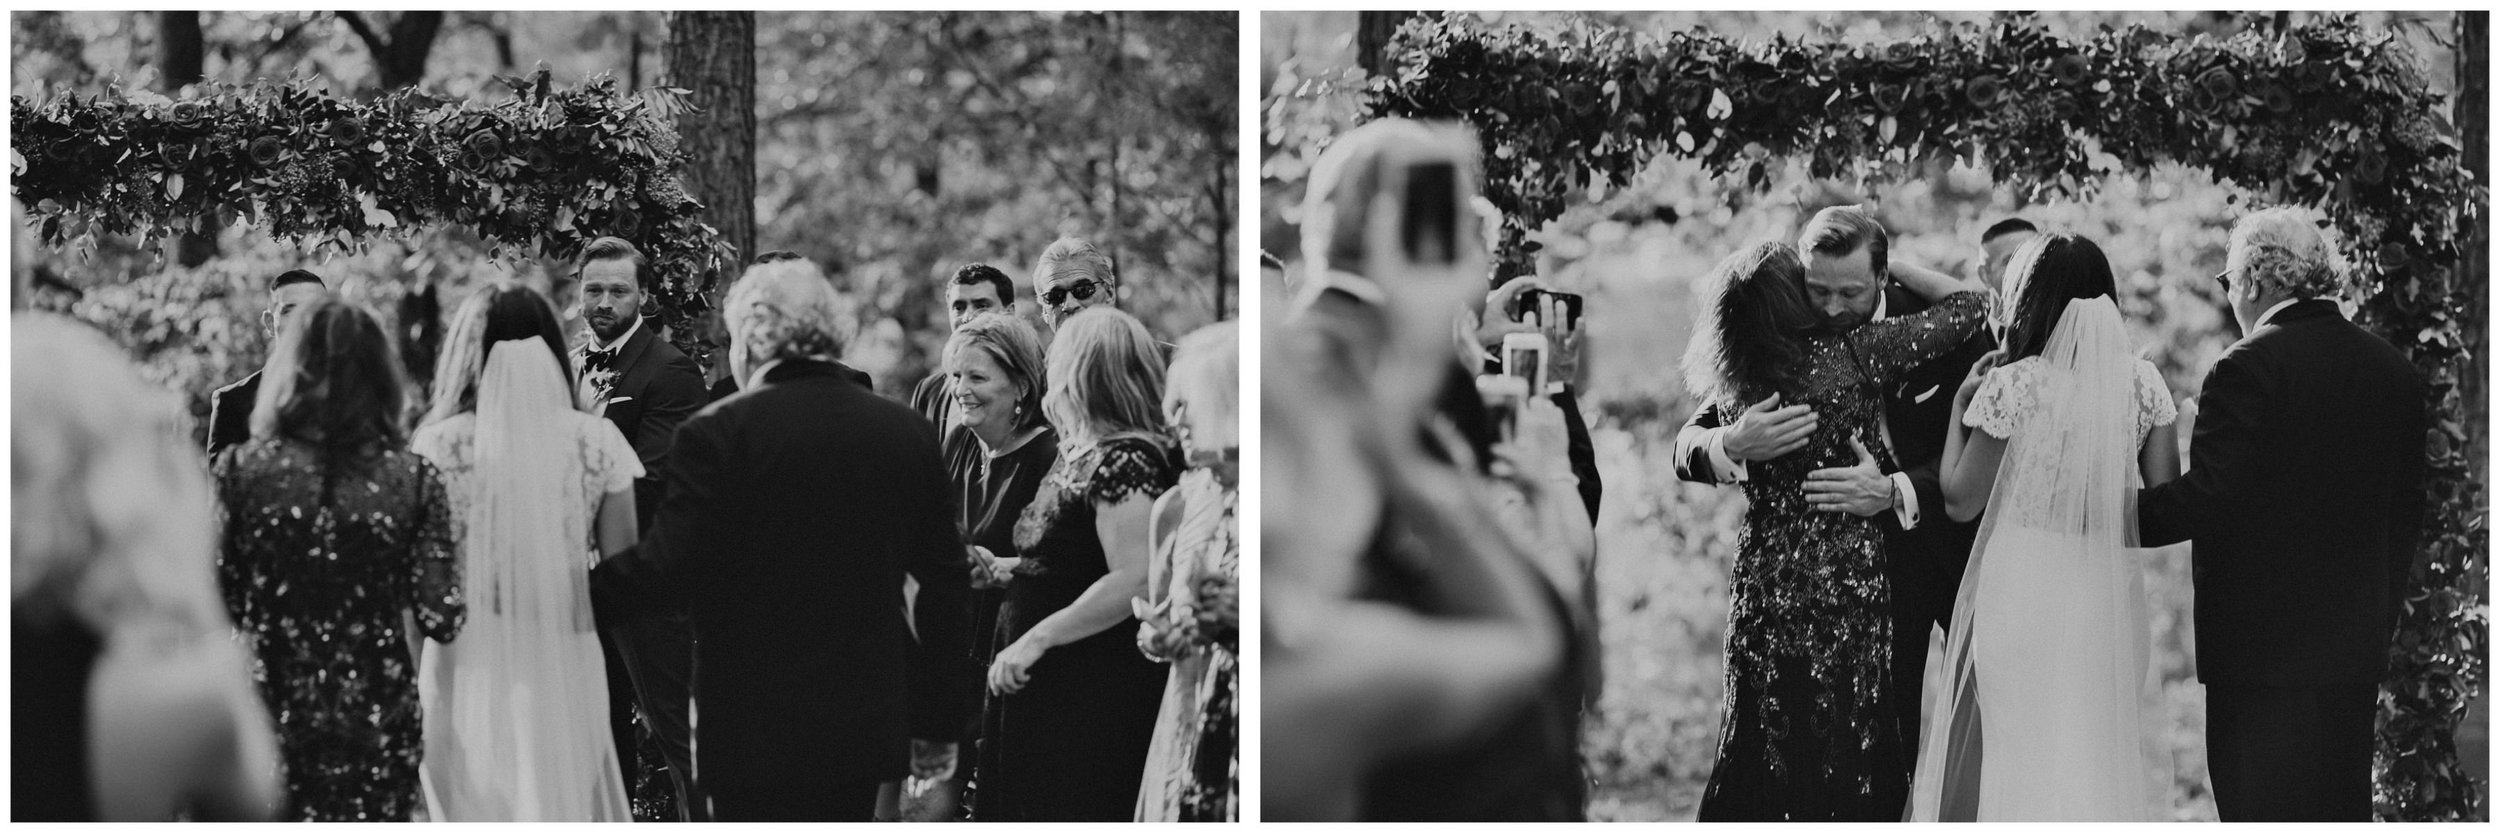 62 - Groom crying at wedding ceremony at serenbi farms atlanta .jpg